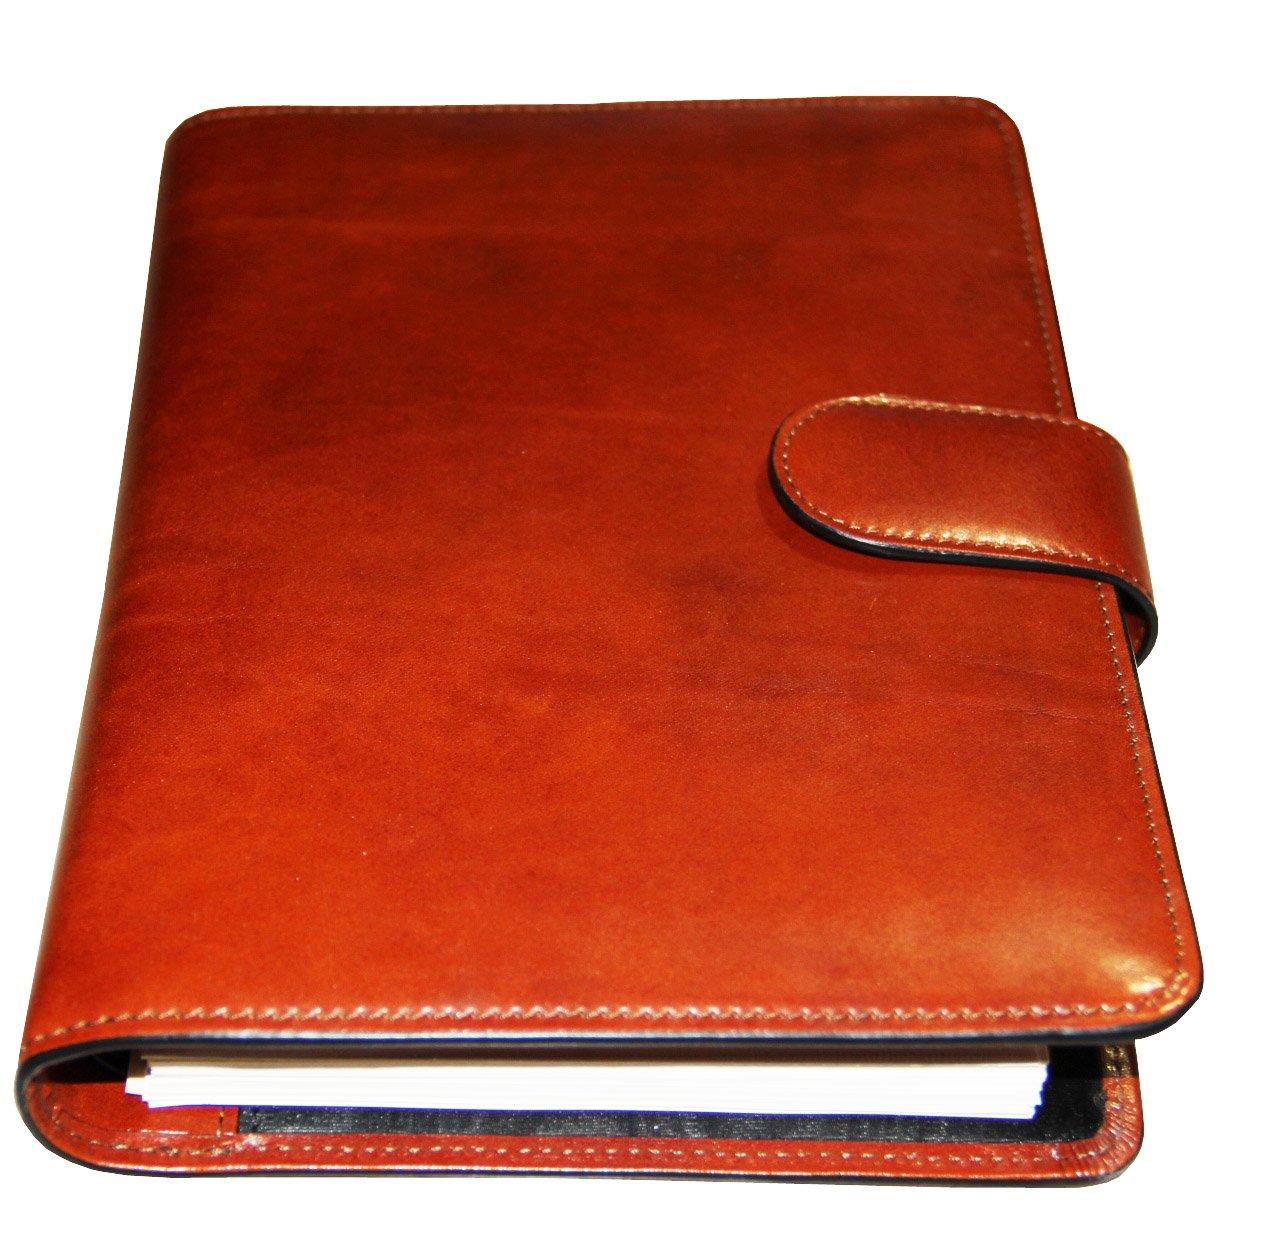 Bosca Old Leather Address Book Weekly Minder Agenda Planner - Amber